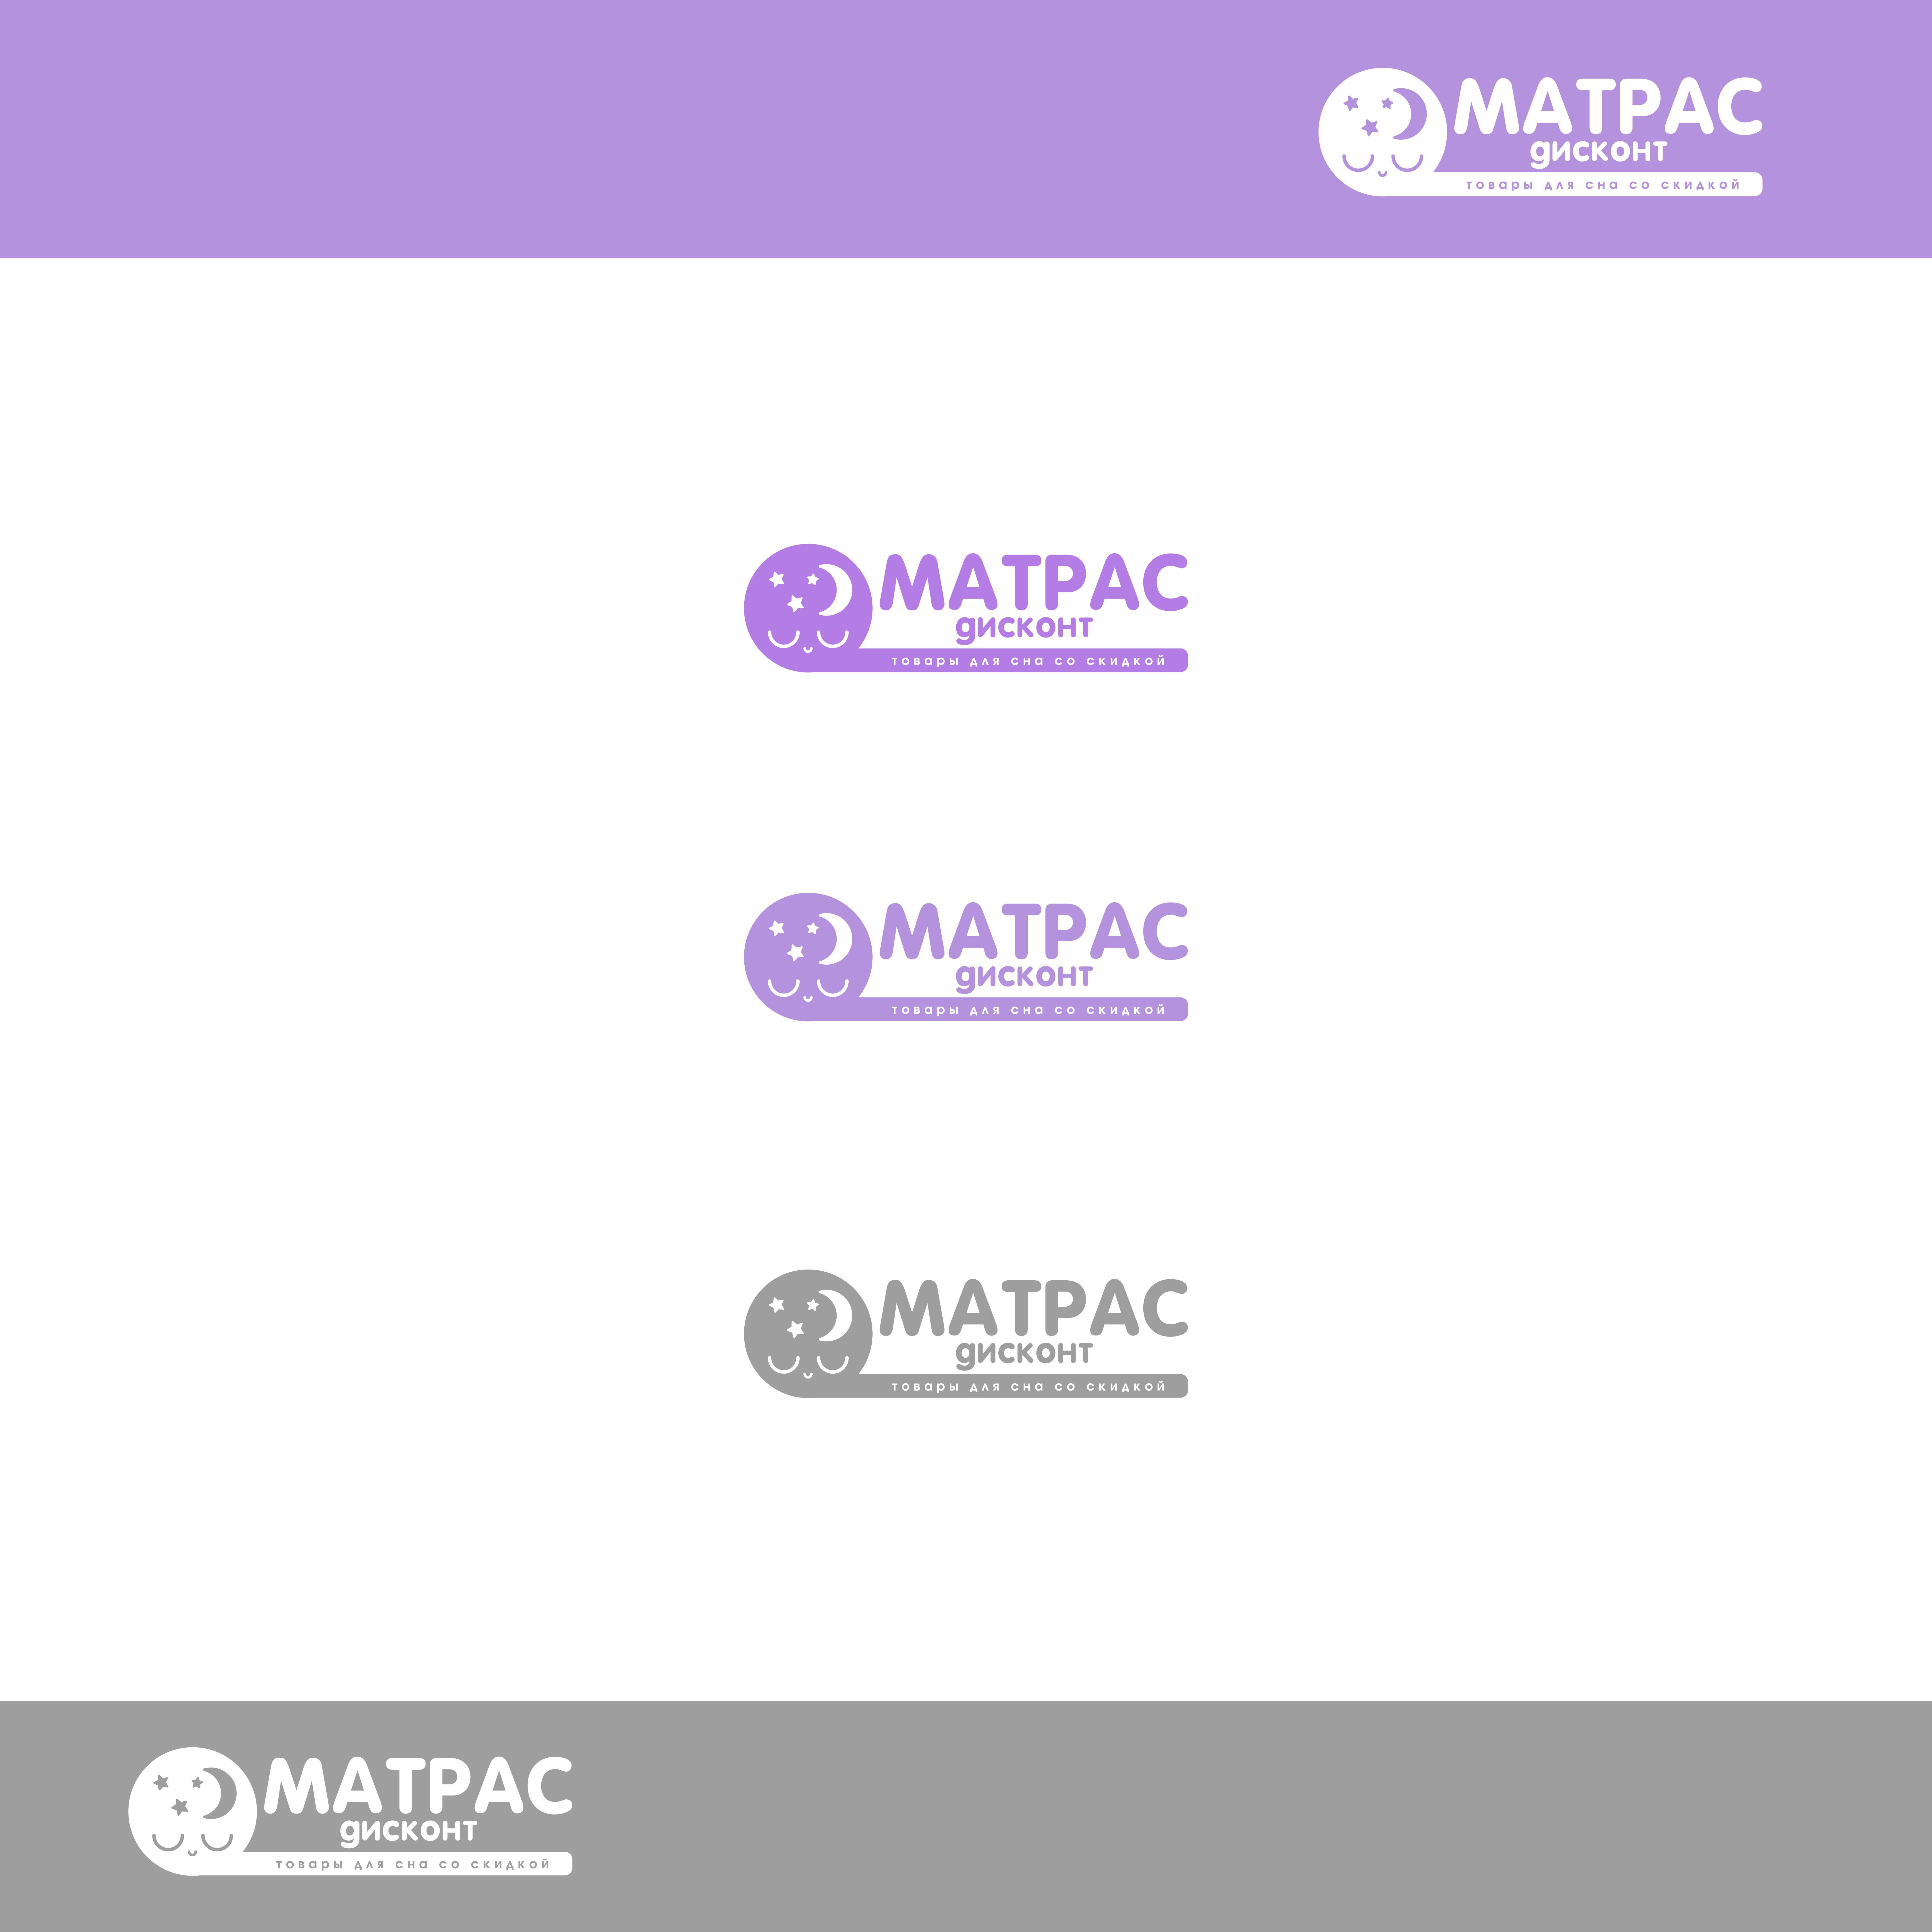 Логотип для ИМ матрасов фото f_5885c87c61053c2c.jpg